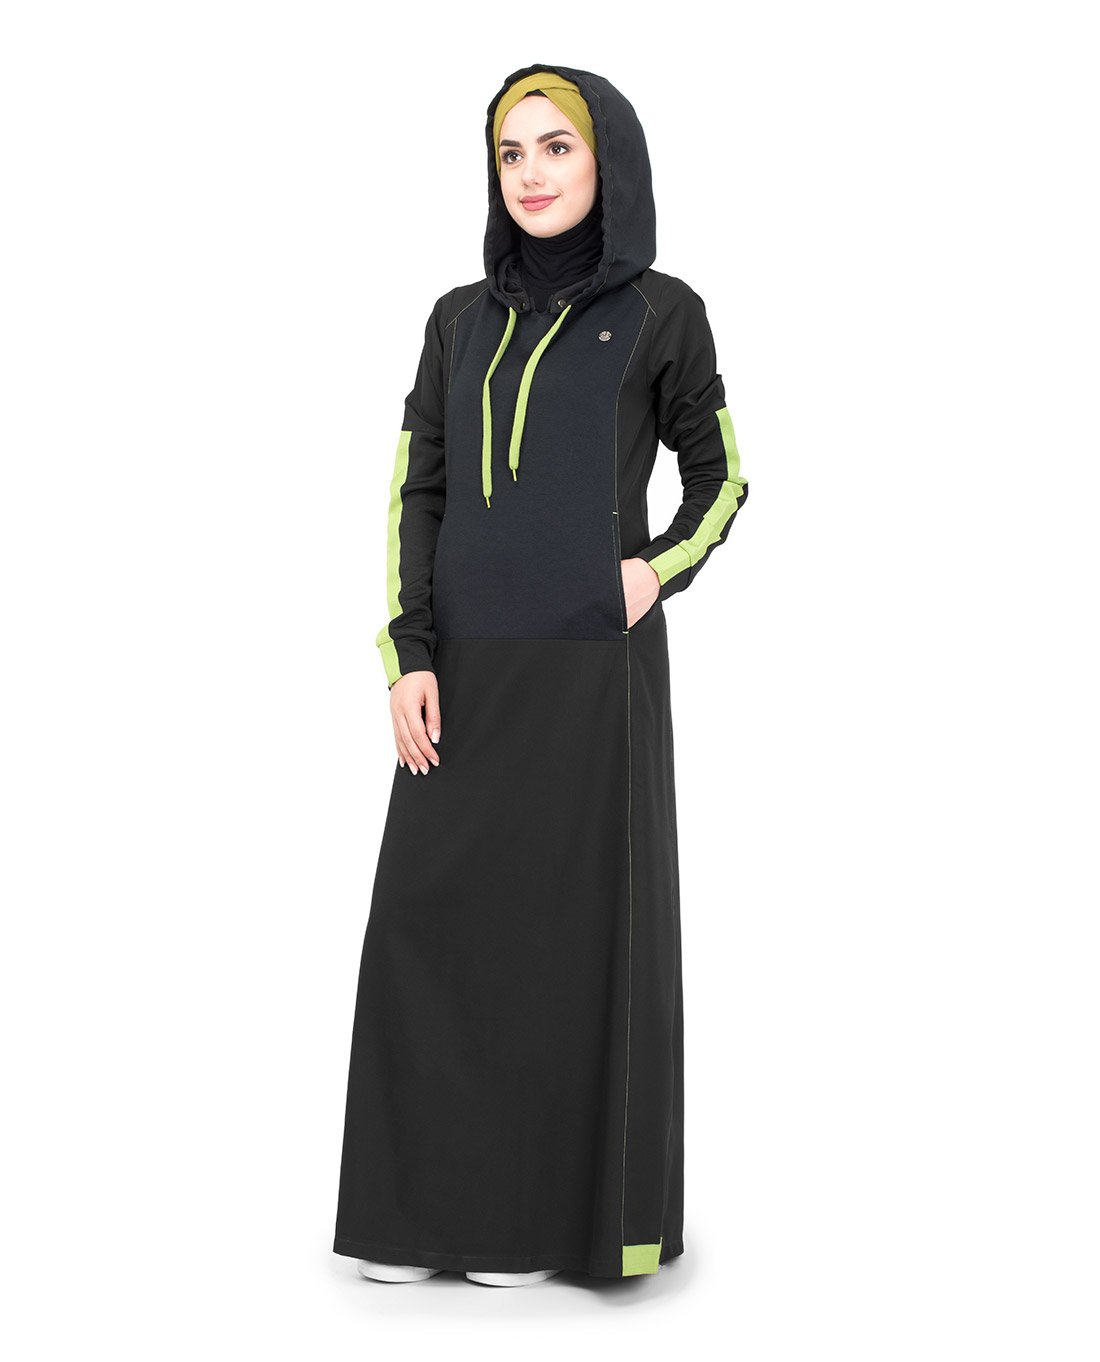 Silk Route Black & Lime Hooded Taslon Sporty Maxi Dress Jilbab Medium 58